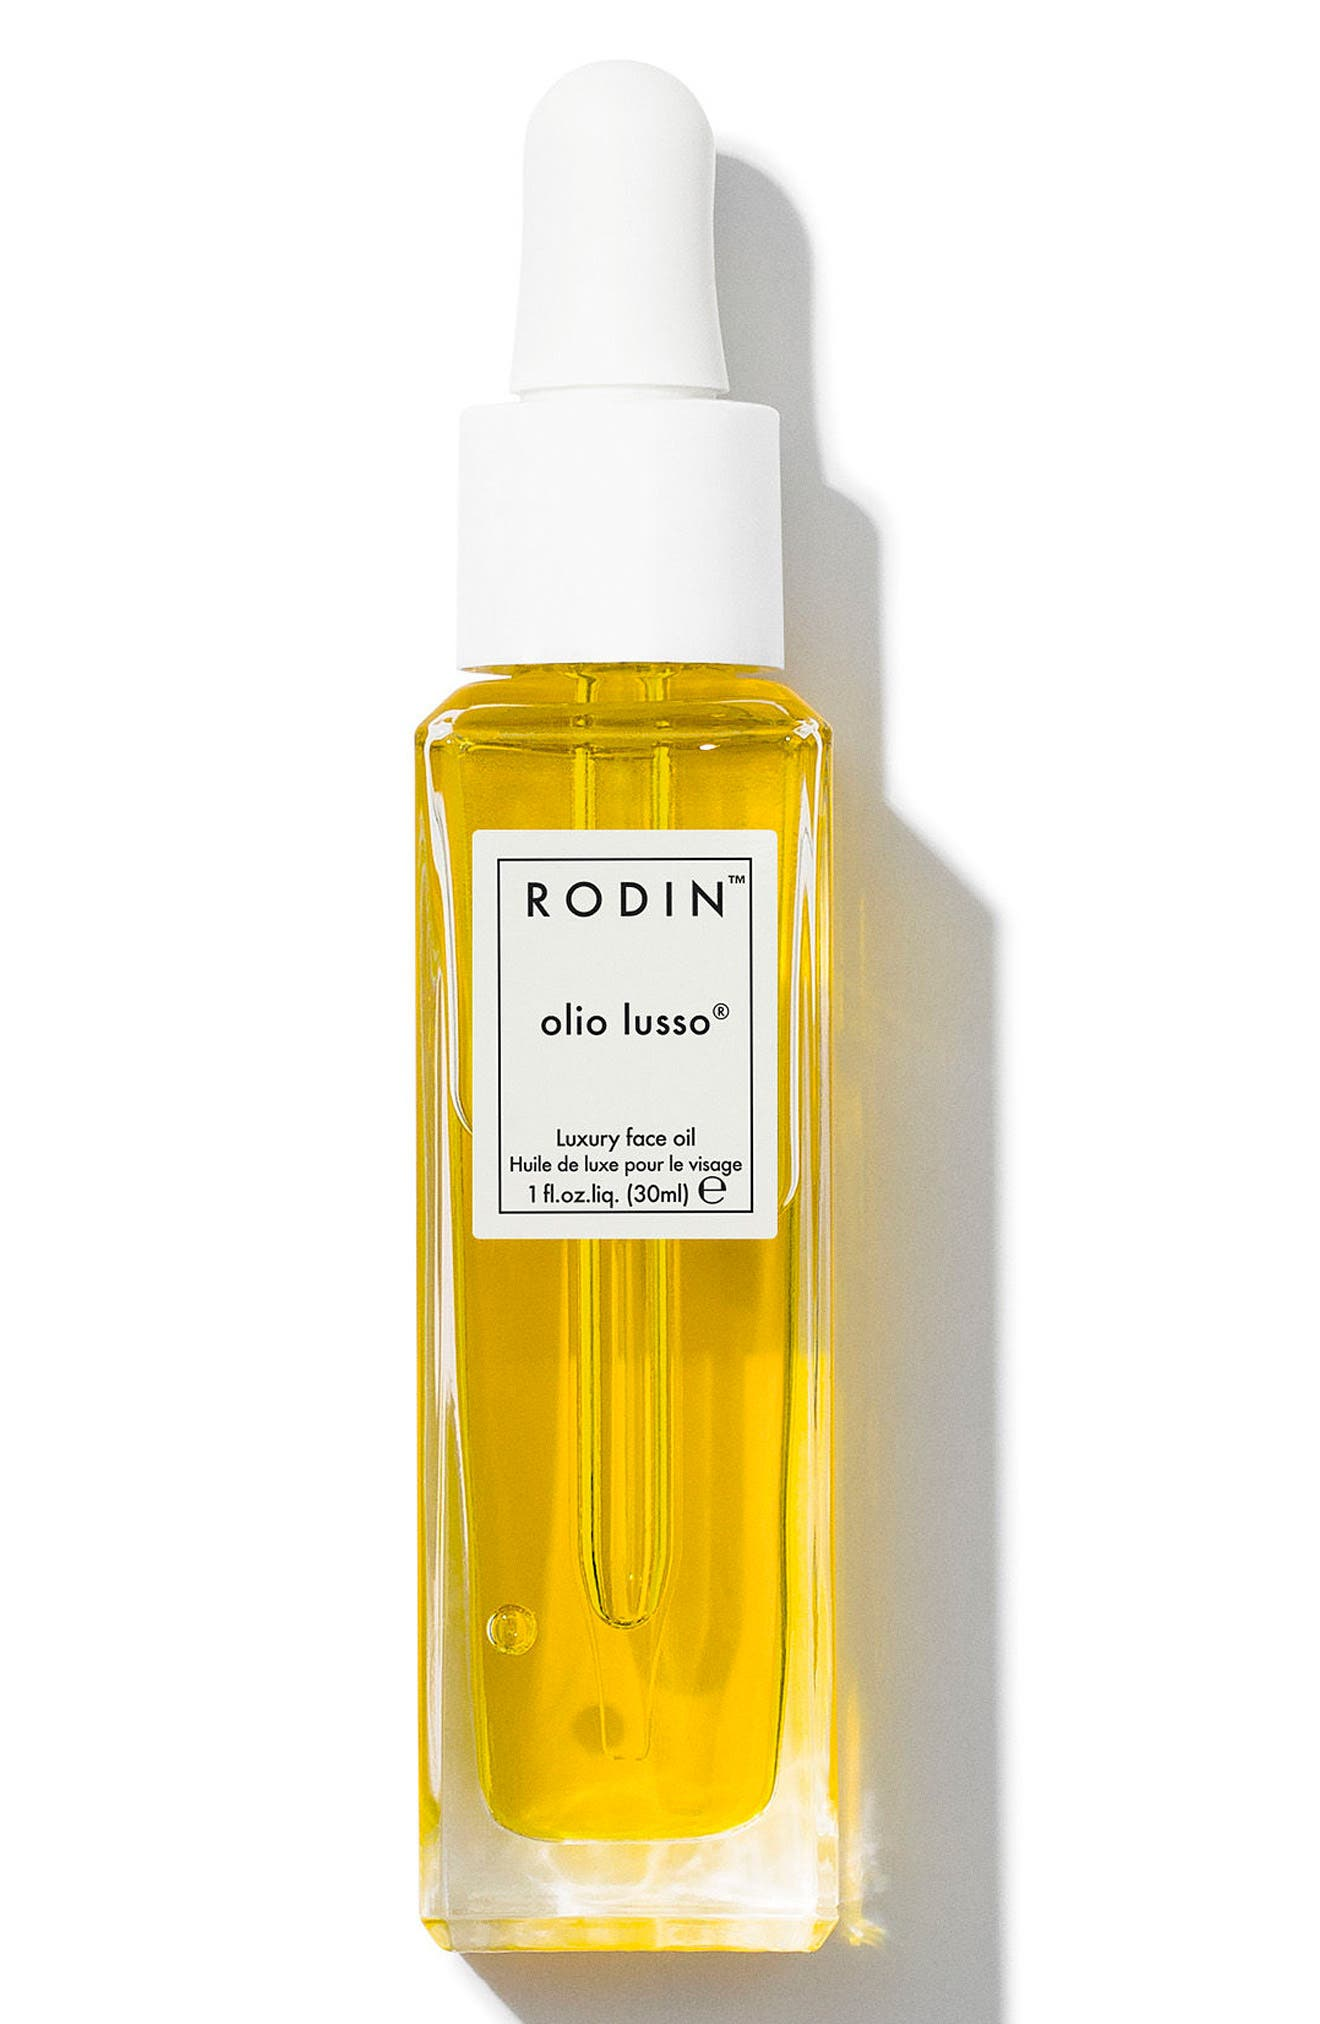 Jasmine/Neroli Luxury Face Oil,                             Main thumbnail 1, color,                             NO COLOR